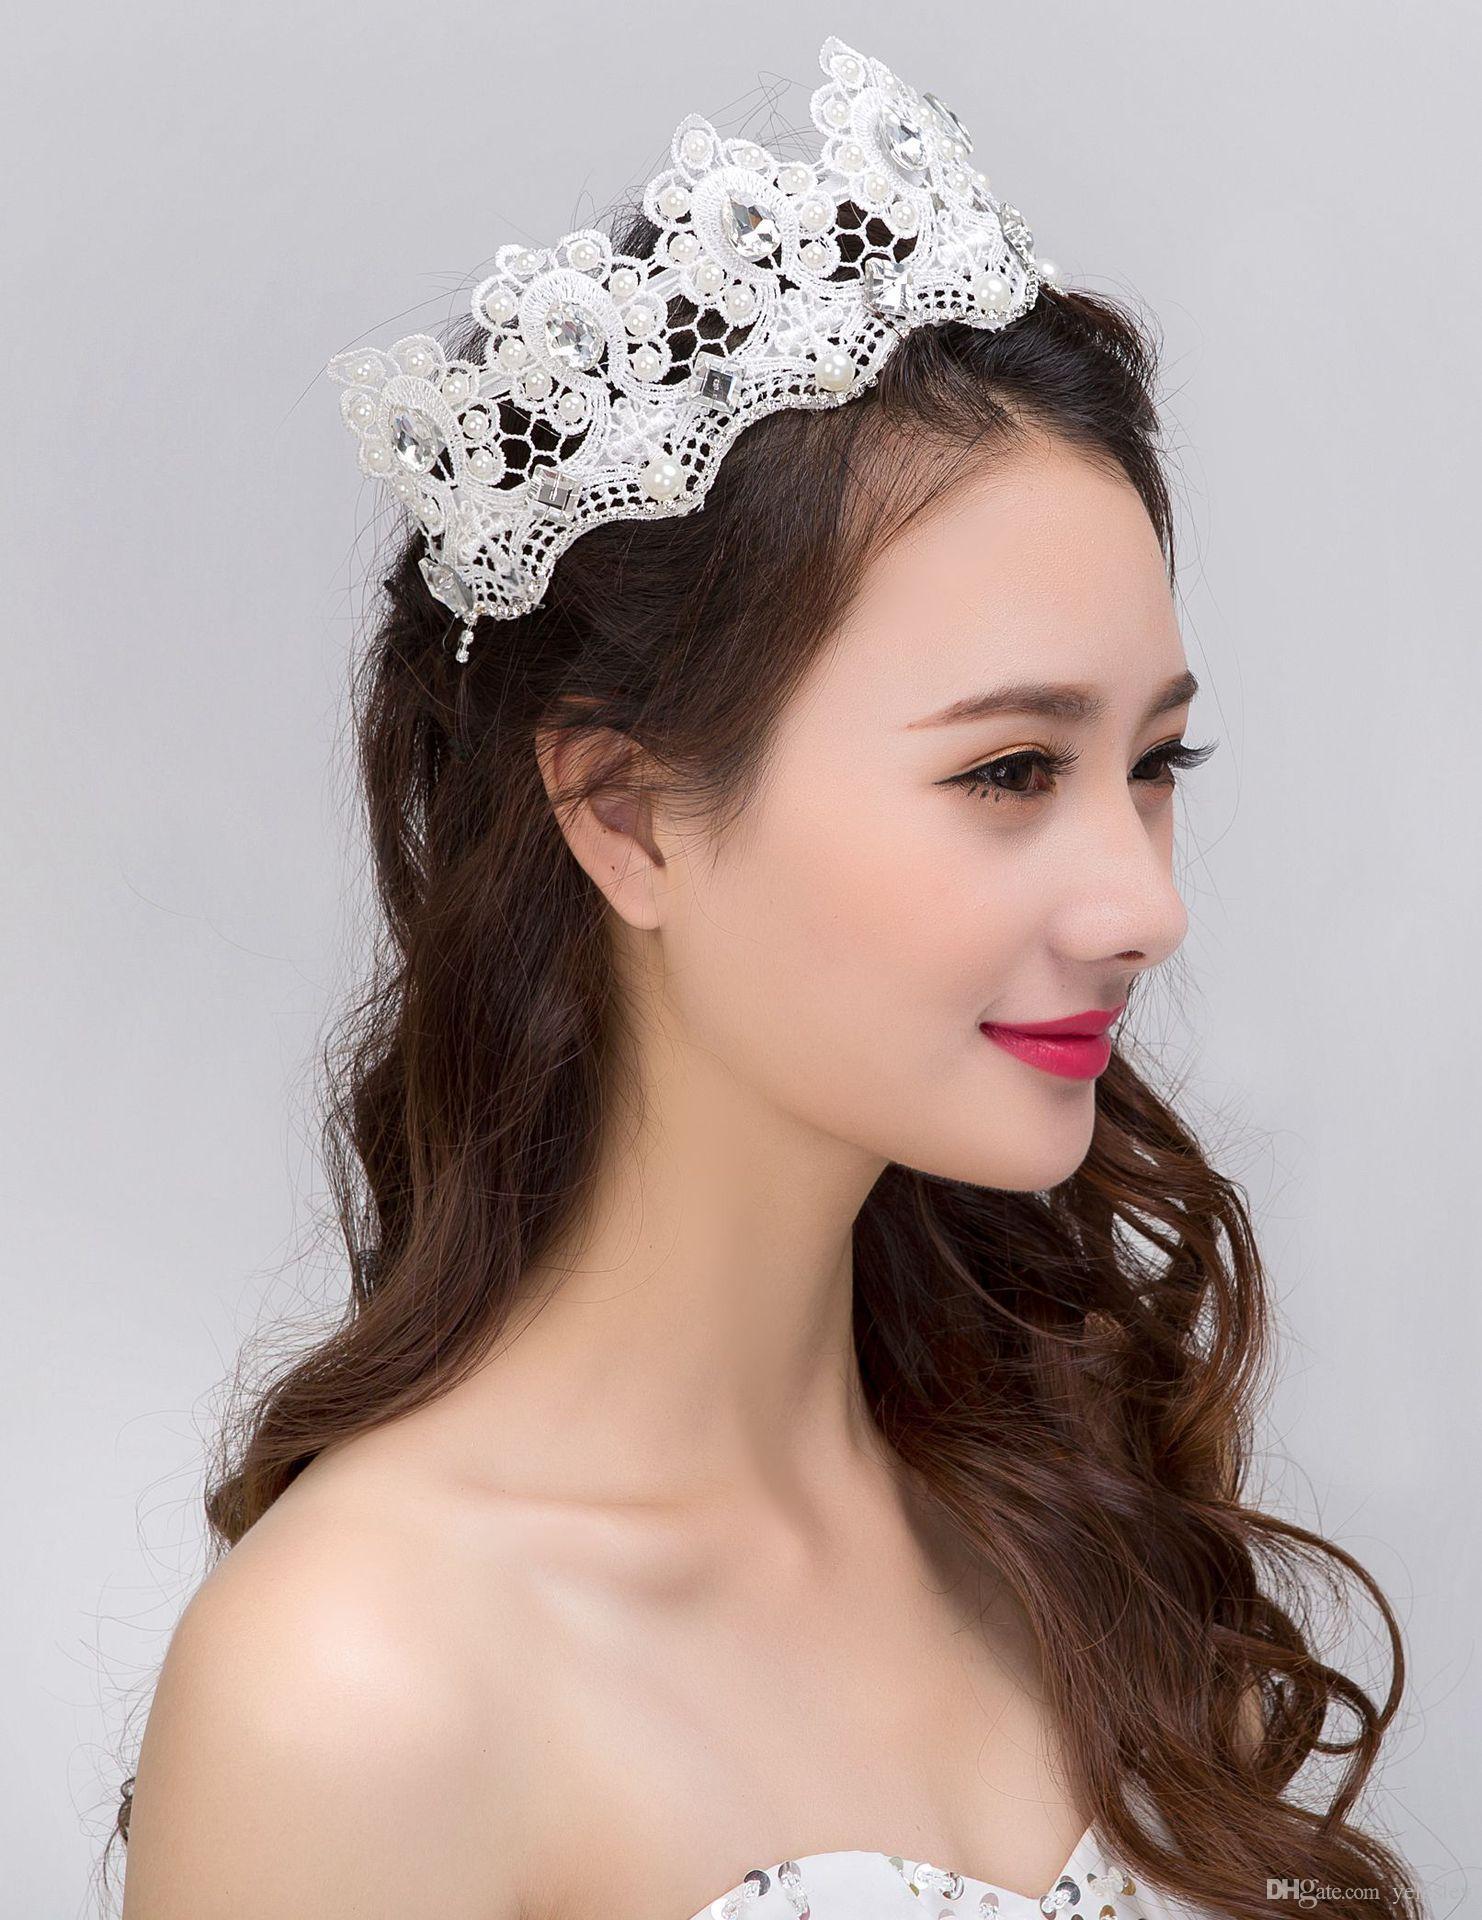 Wedding hair jewelry Royal Crowns Shiny Crystals Real Sample Bridal Wedding Tiara Tiaras Hair Accessories 2016 head pieces Tiara Crystals